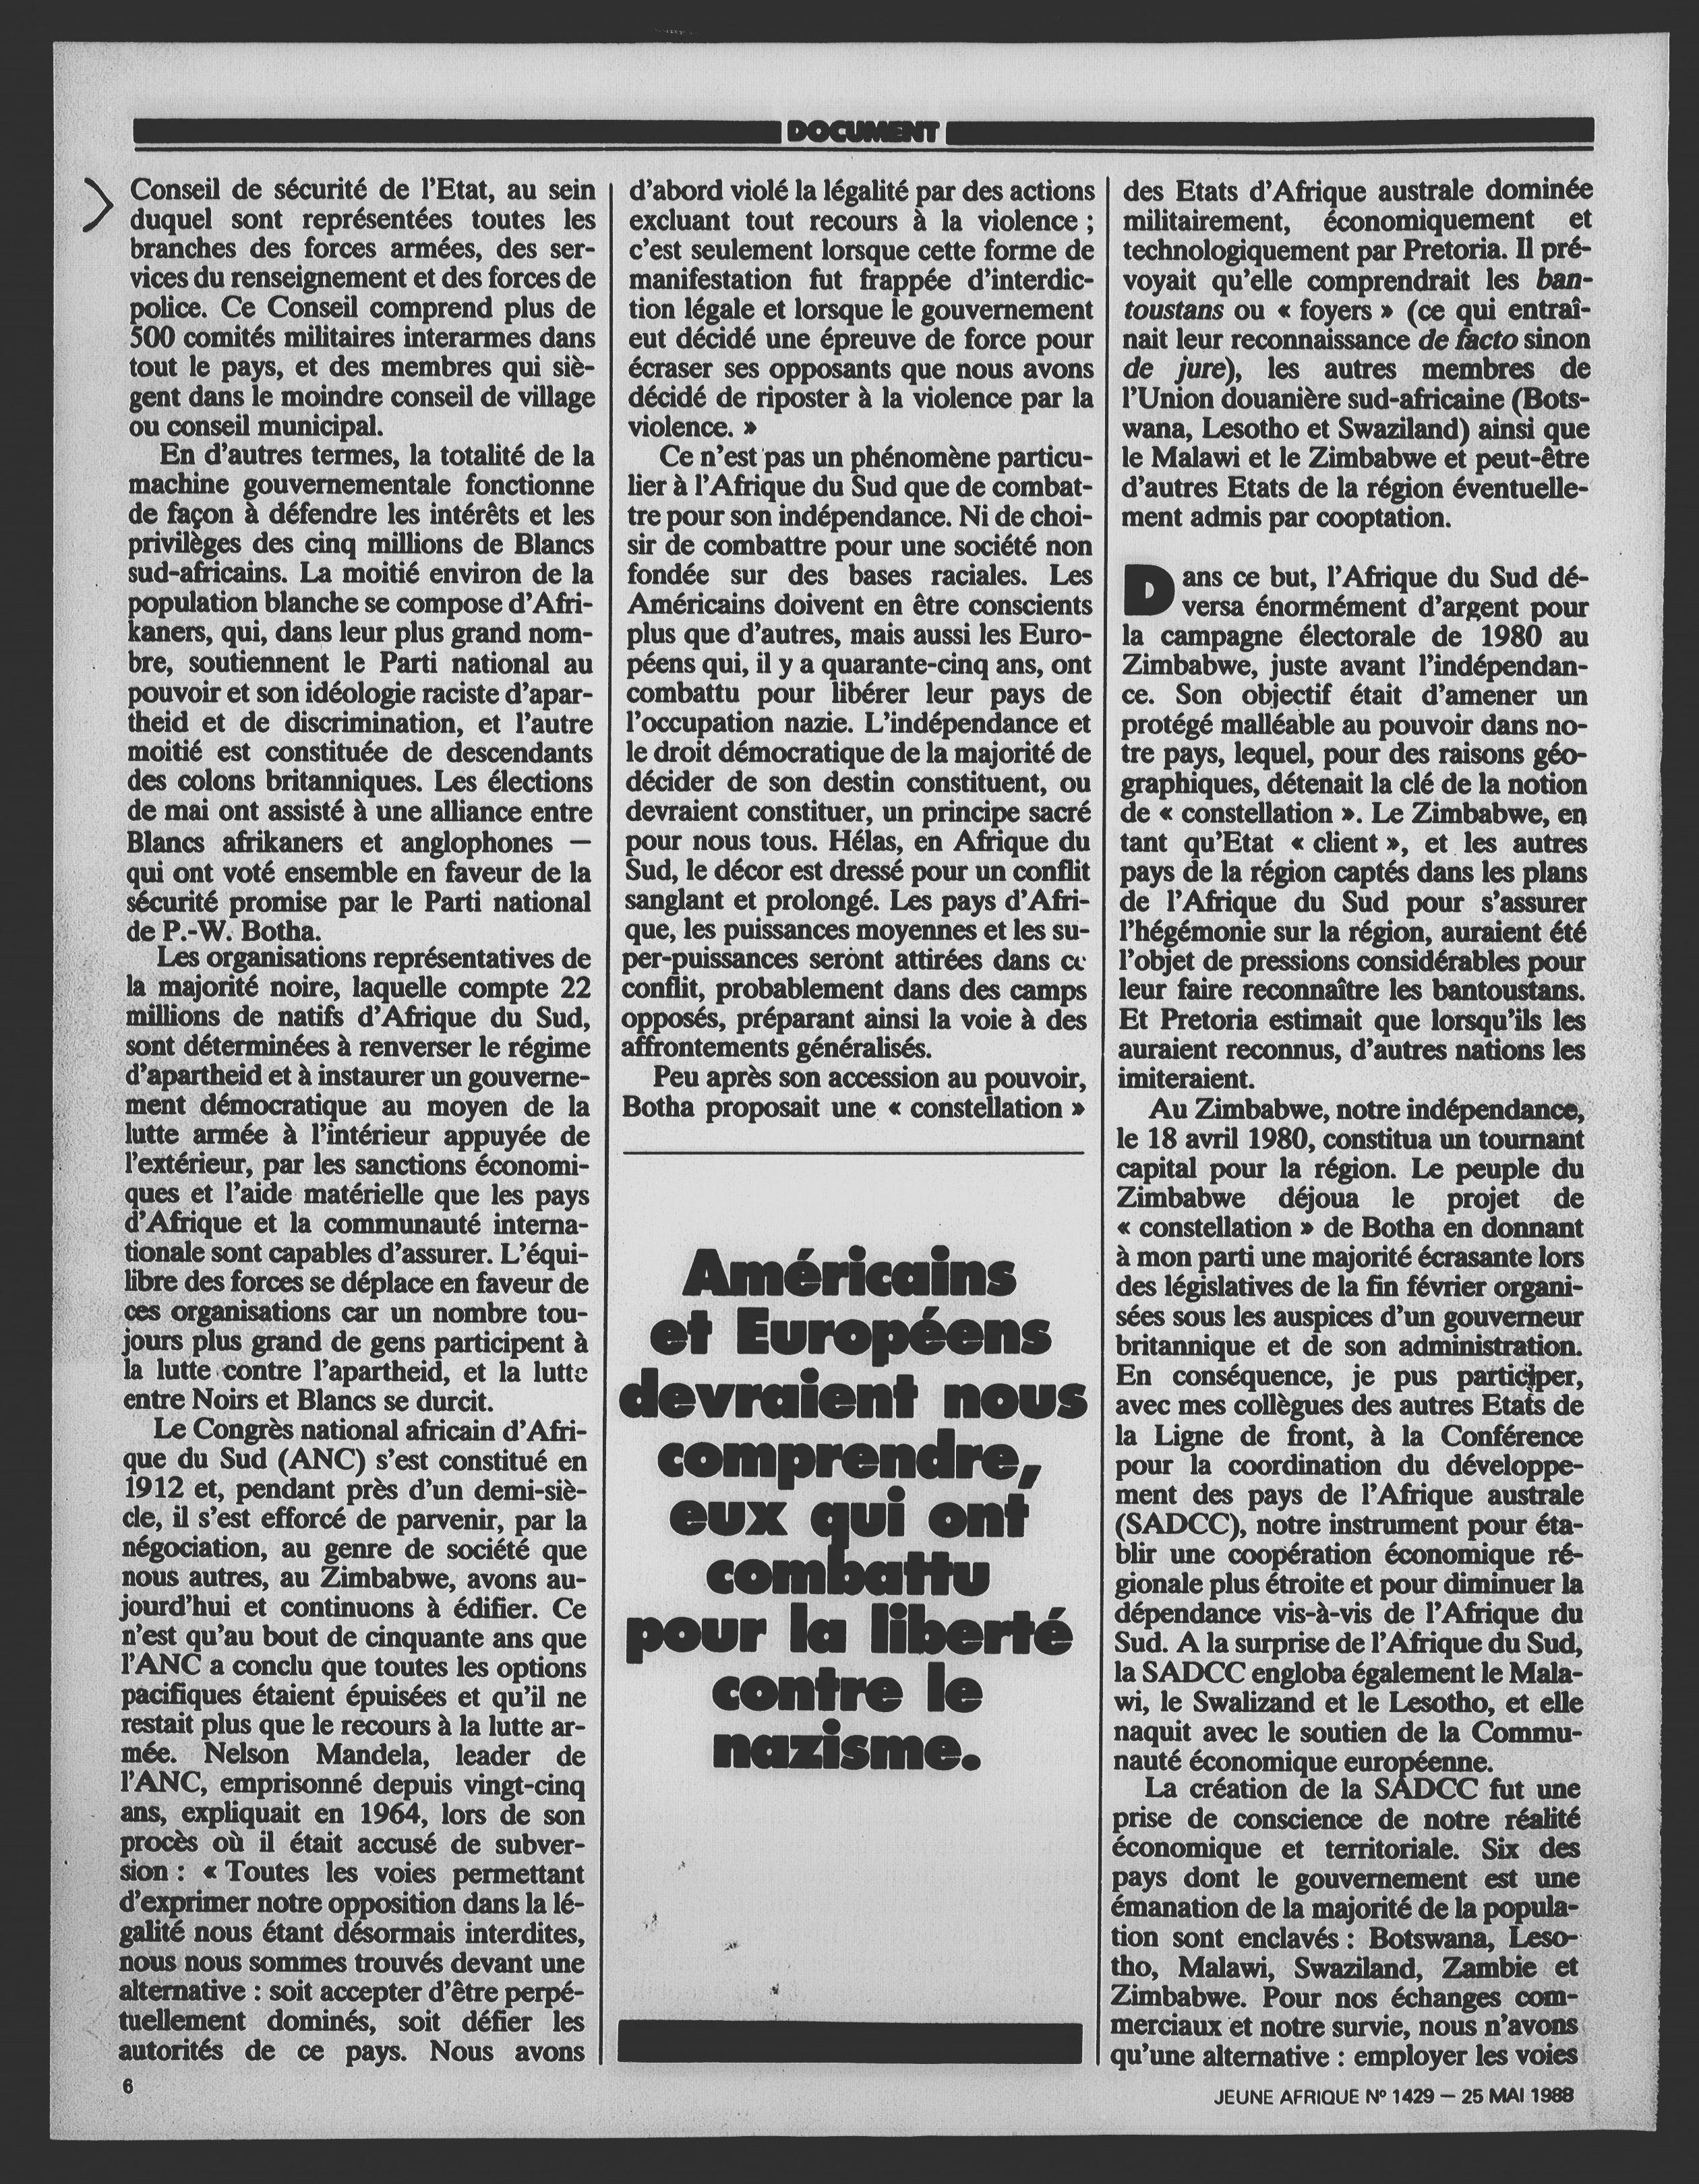 Article daté du 25 mai 1988